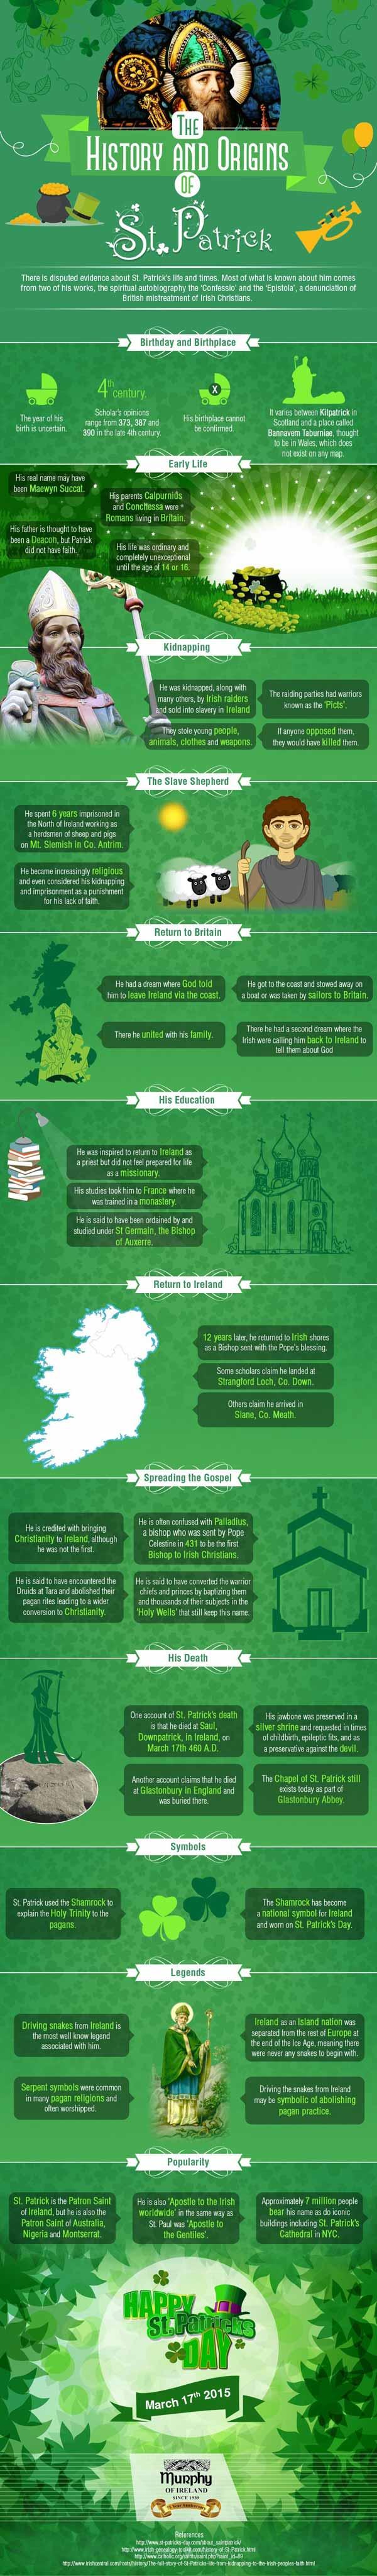 facts about st. patrick, patron saint of ireland